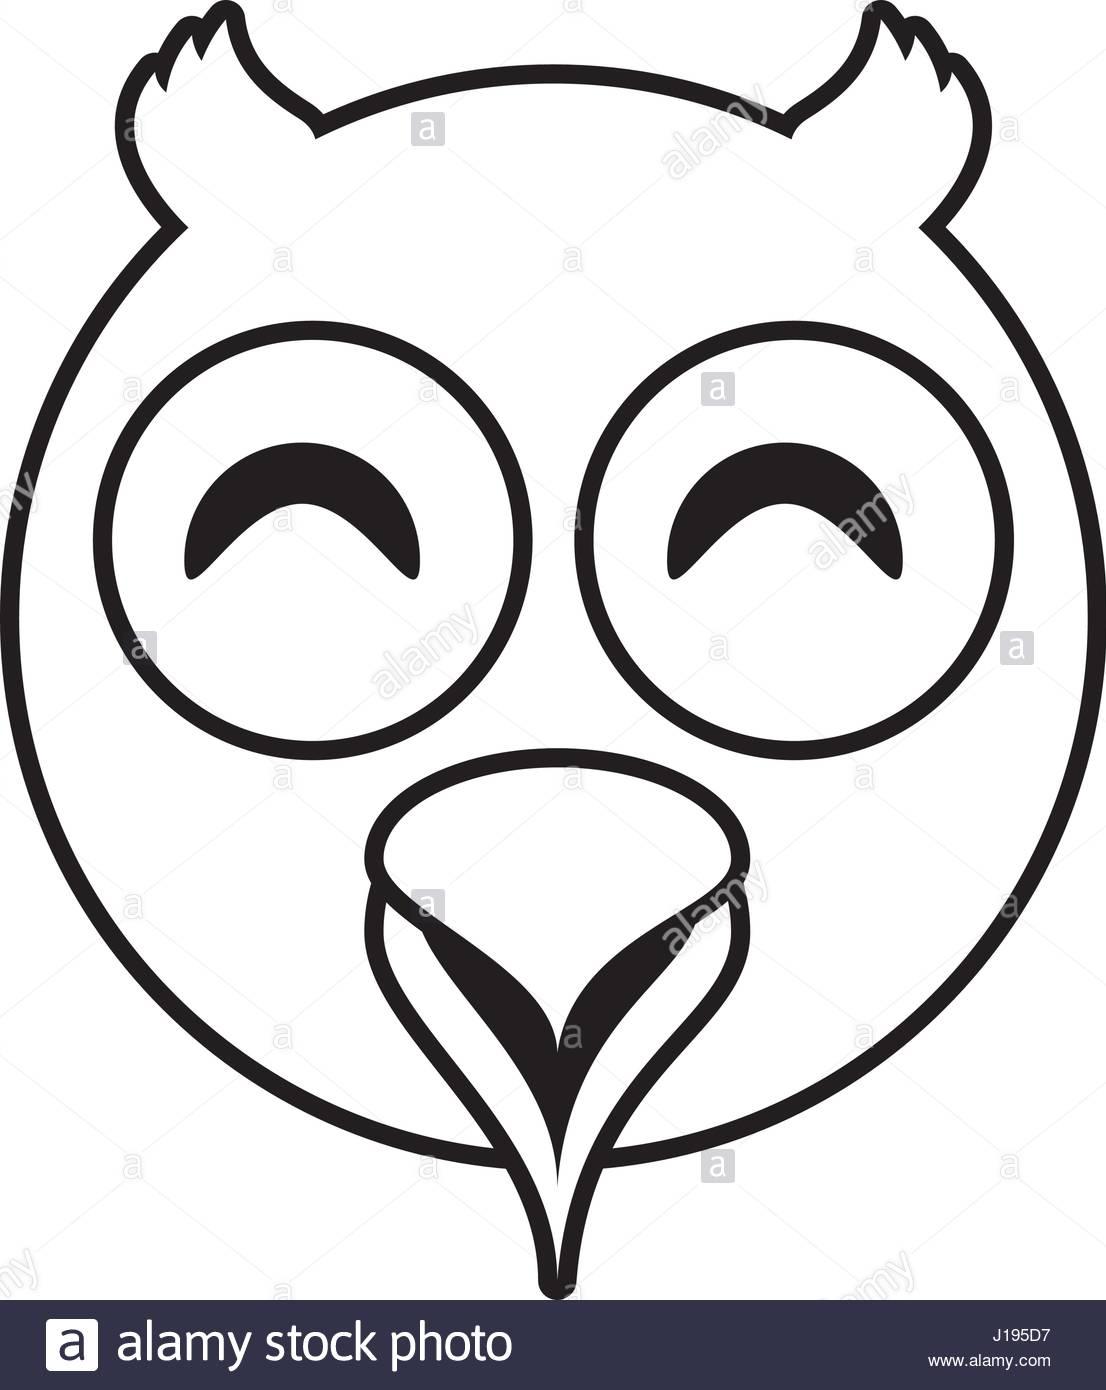 1106x1390 Owl Face Animal Outline Stock Vector Art Amp Illustration, Vector